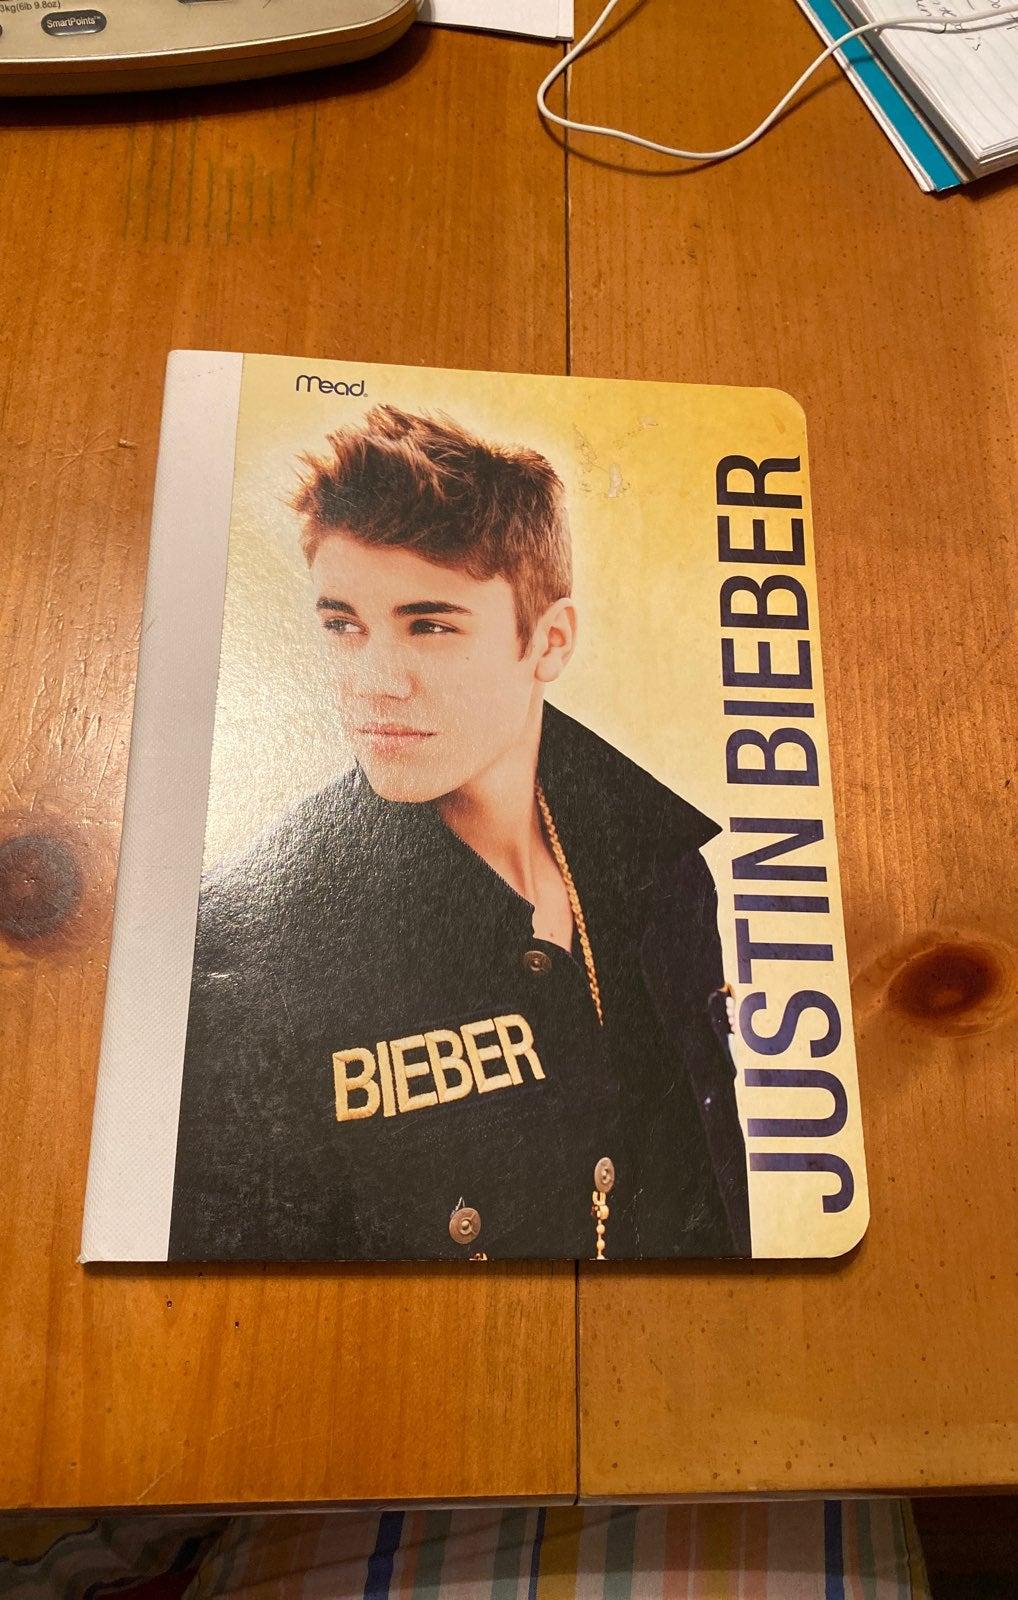 Justin Bieber Mead Notebook